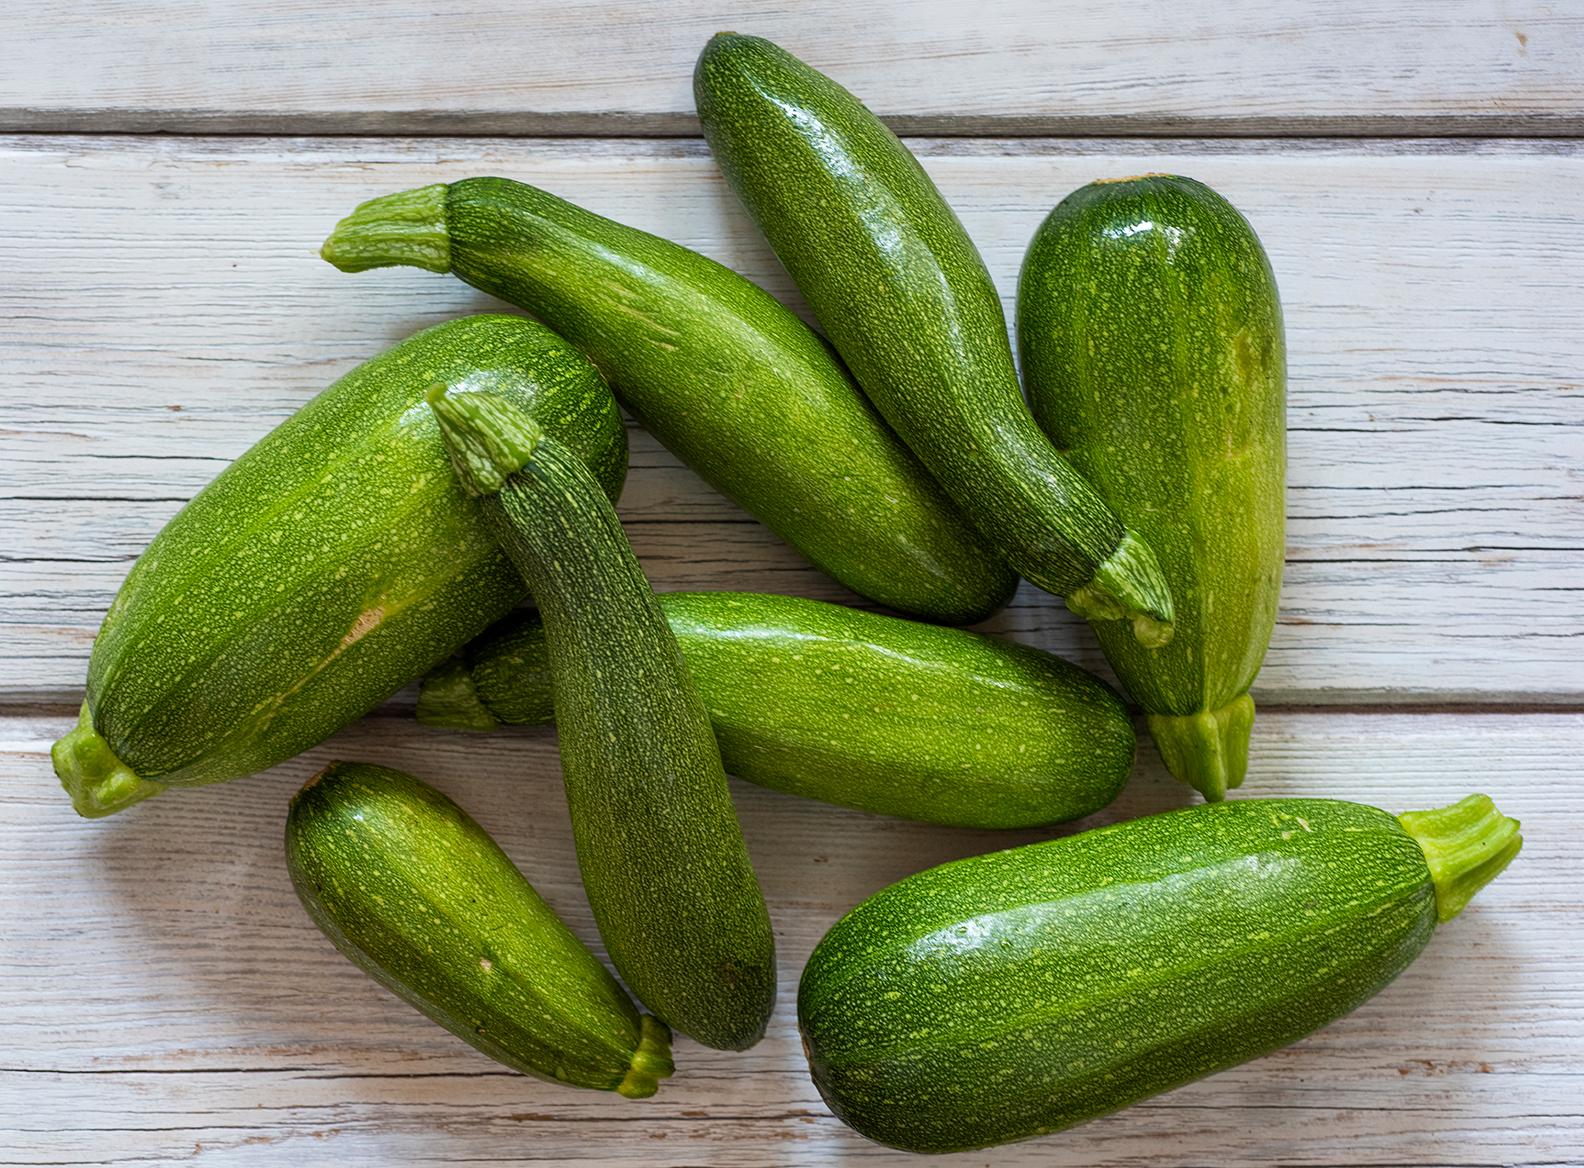 Zucchinis 01 sml